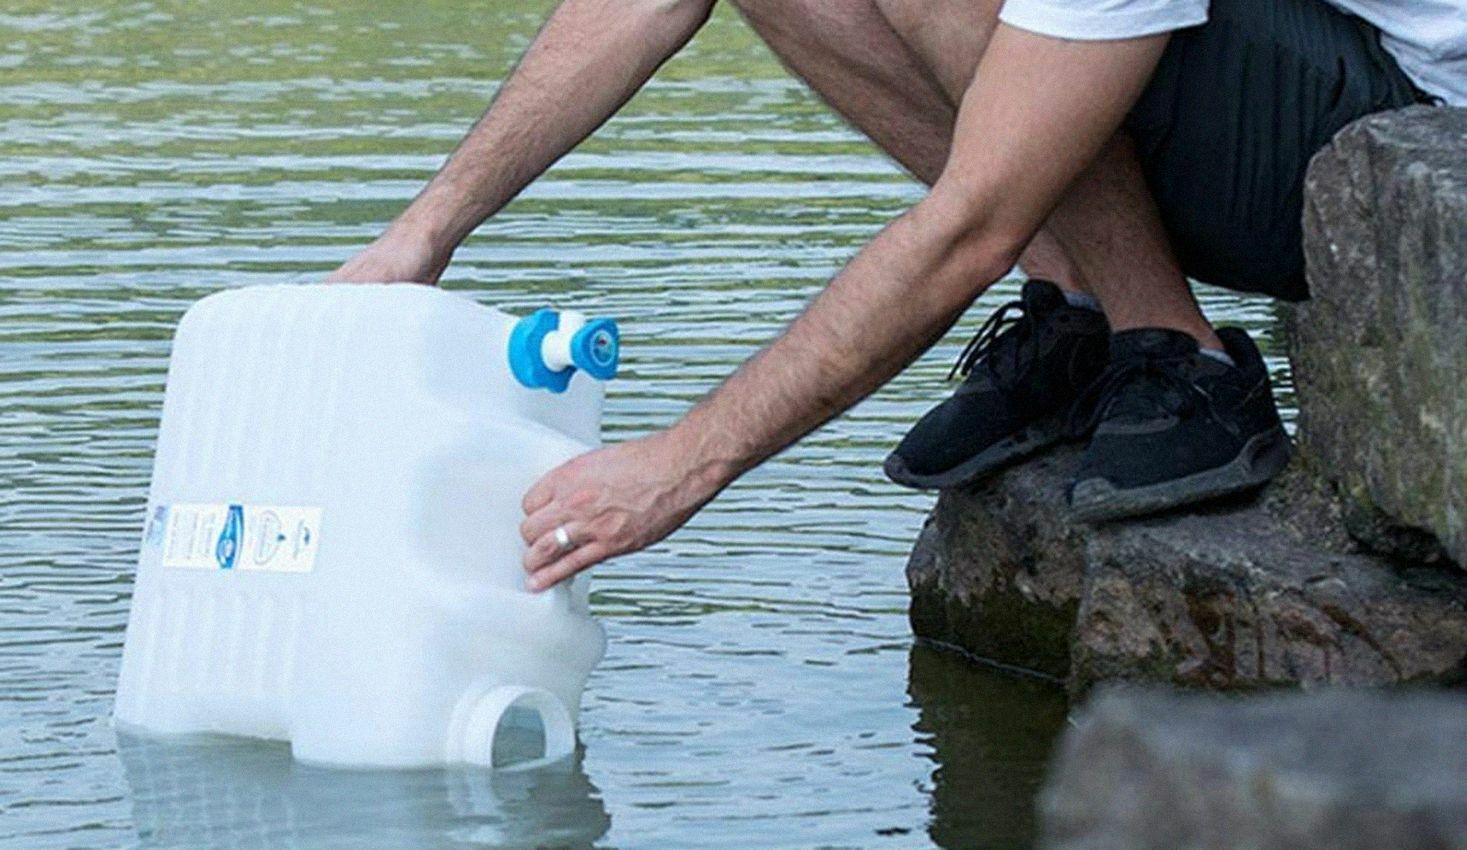 Almacenamiento de agua en casa para casos de emergencia